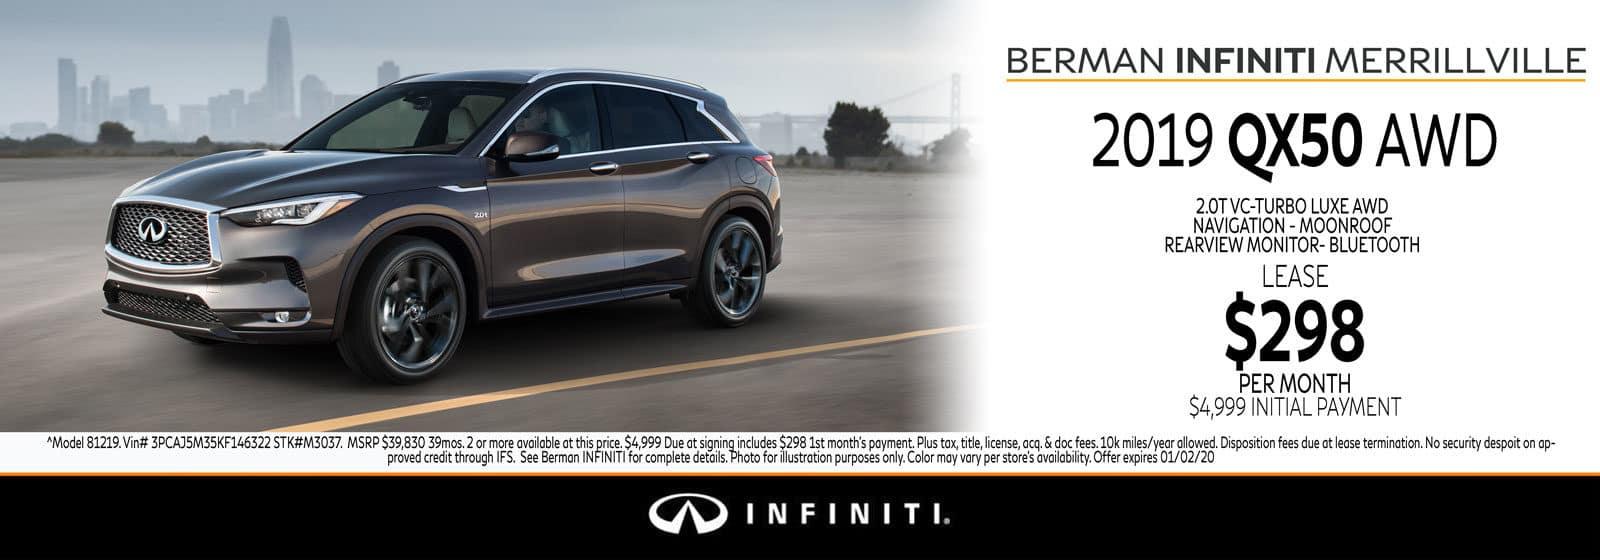 New 2019 INFINITI QX50 December Offer at Berman INFINITI of Merrillville!